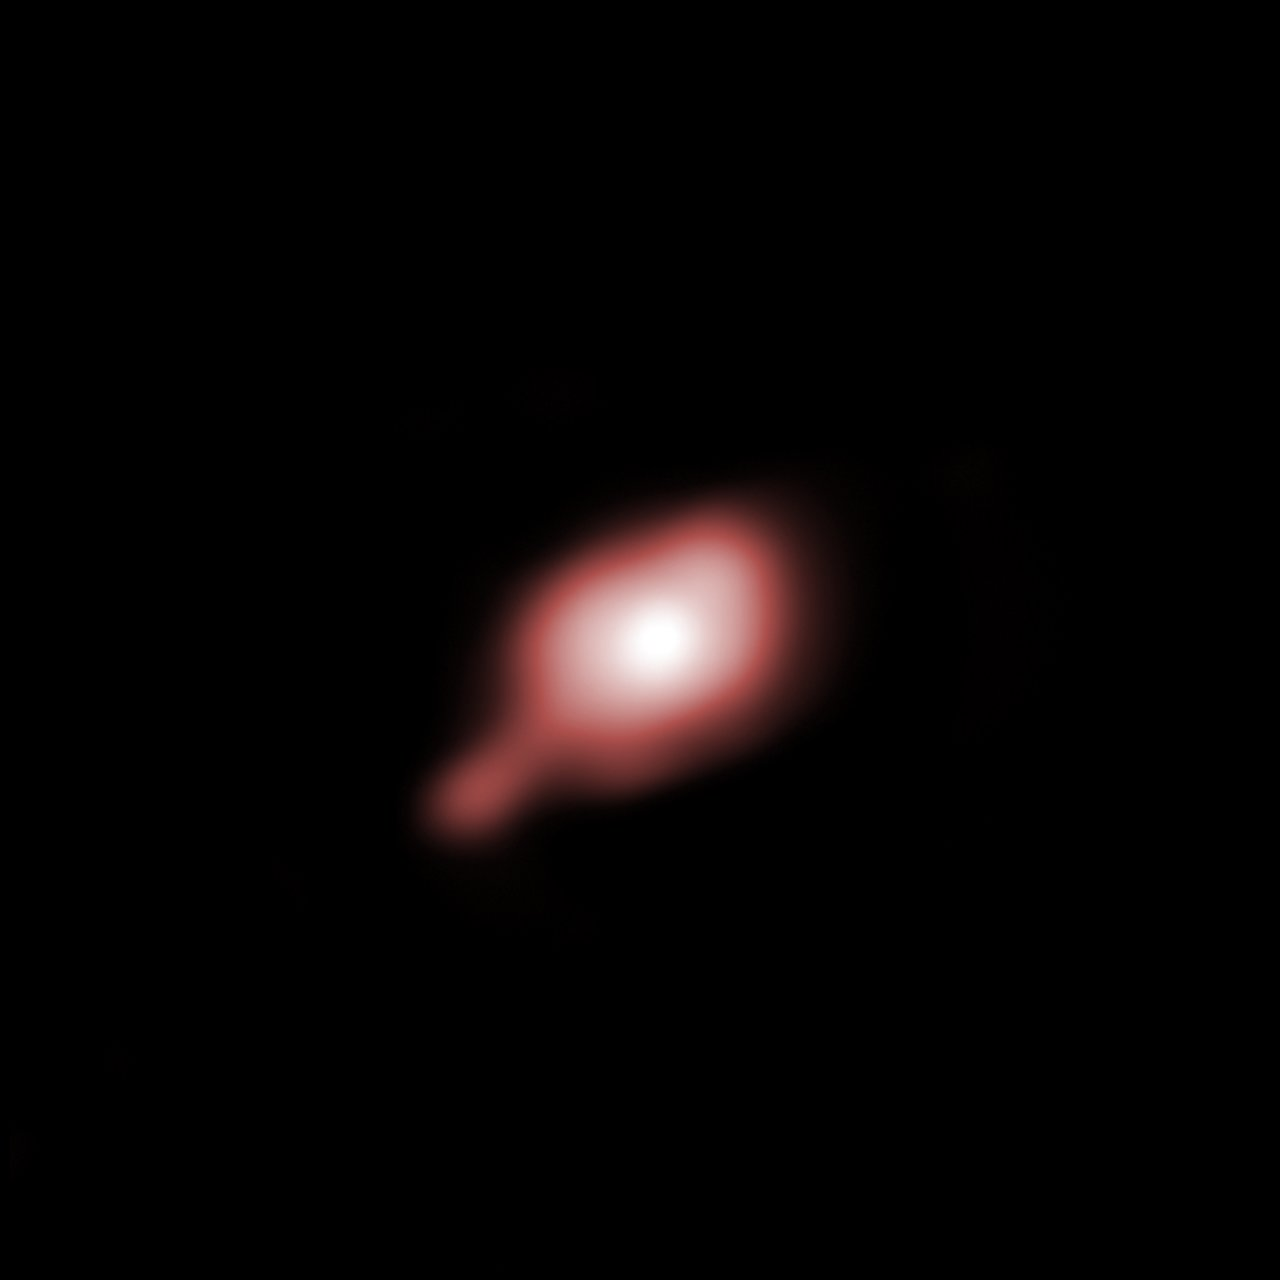 The disc around IRAS 13481-6124